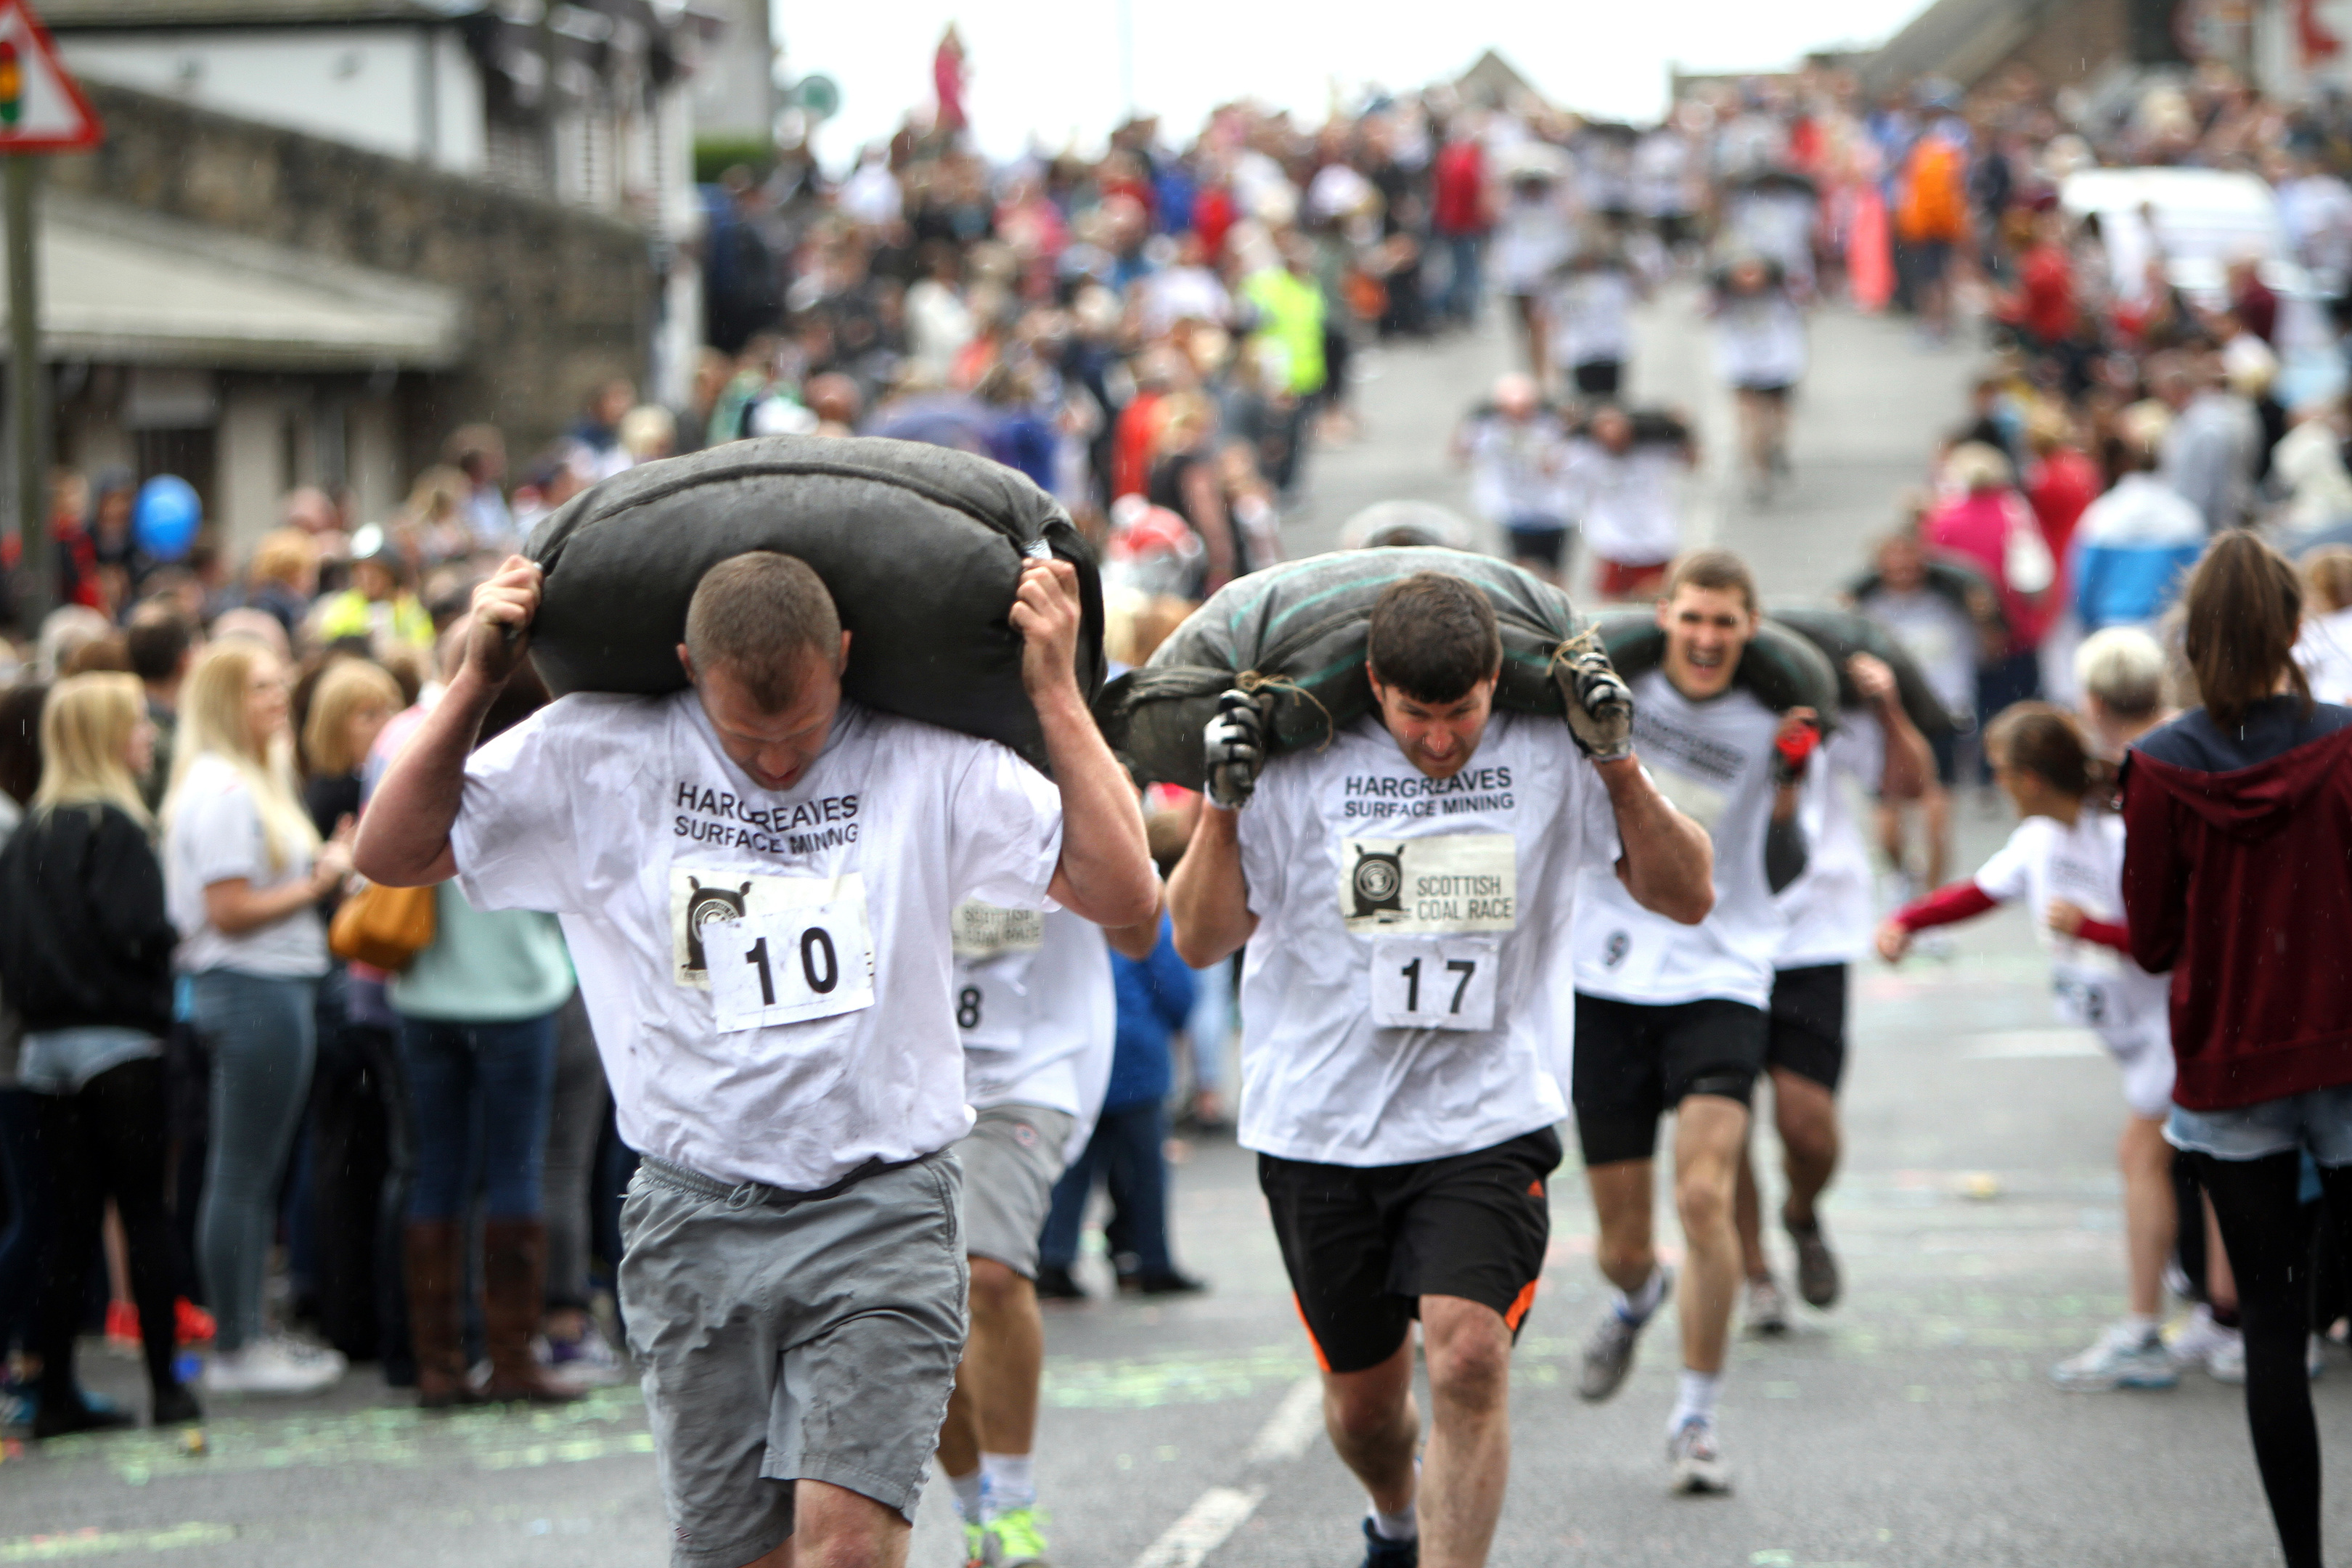 The Kelty coal race.